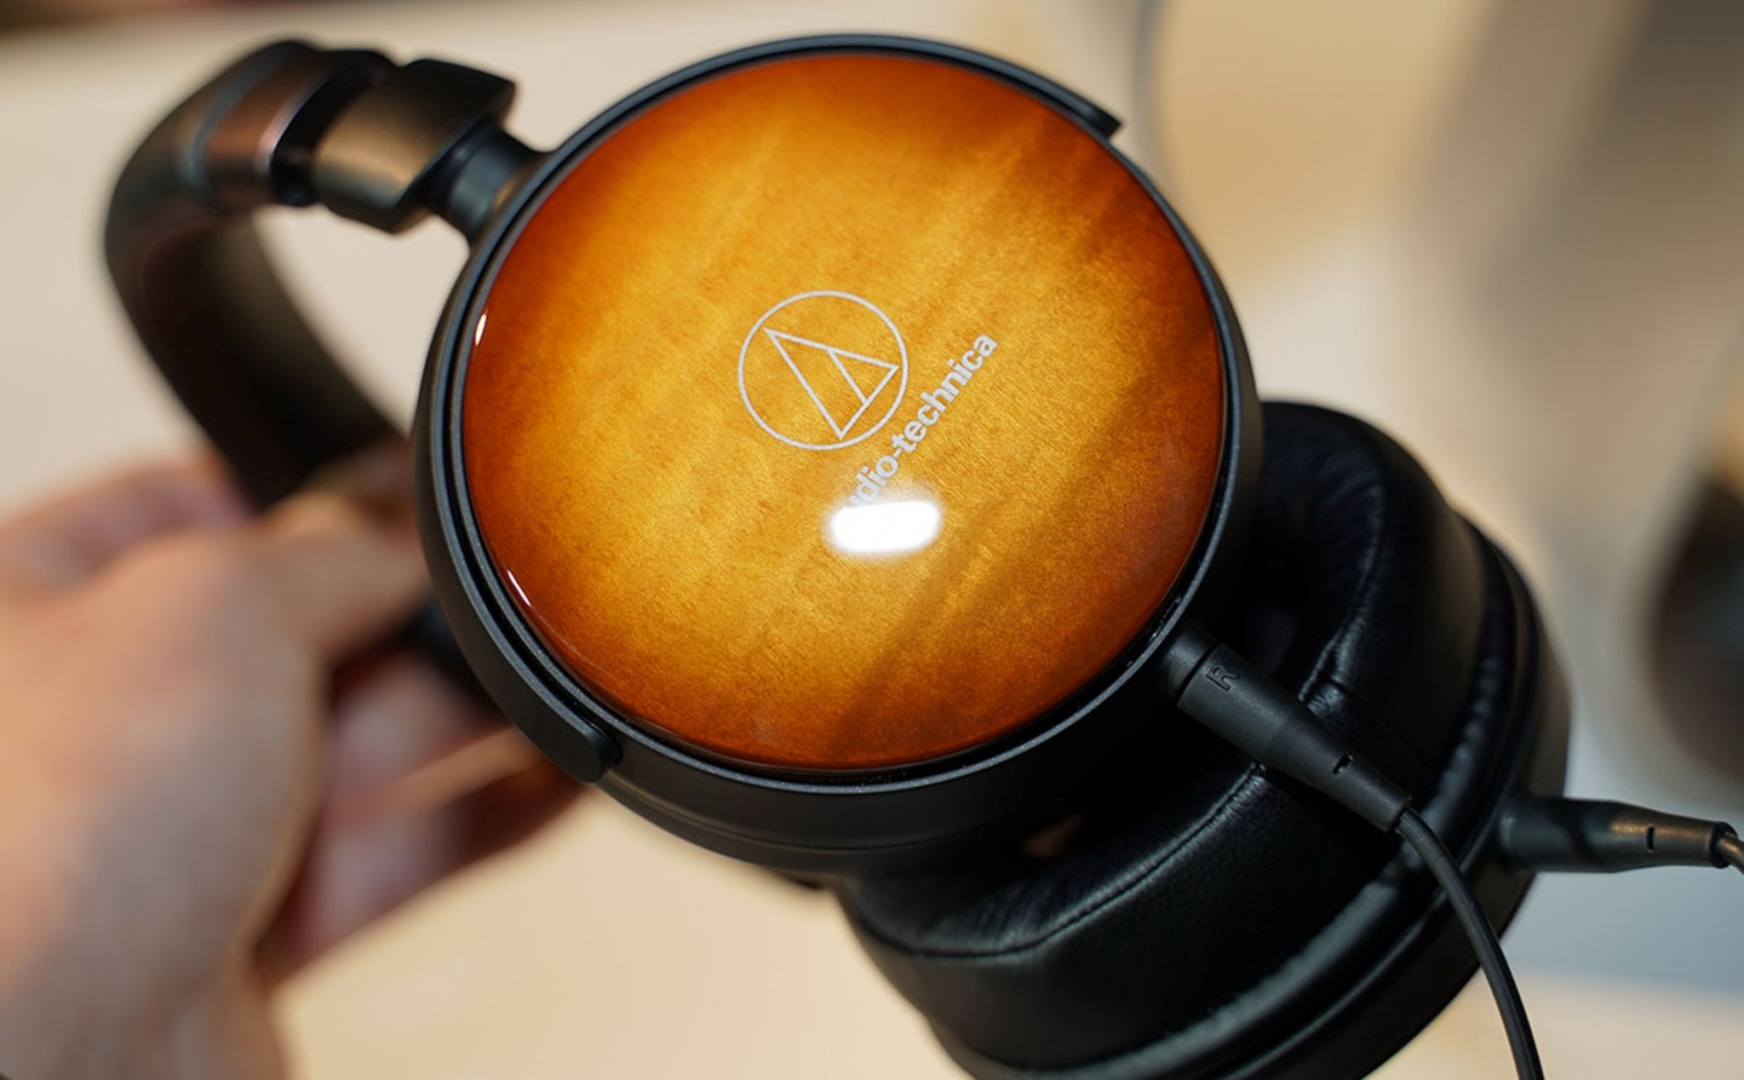 ATH-WP900: Mẫu tai nghe portable cao cấp vỏ gỗ maple của Audio-Technica